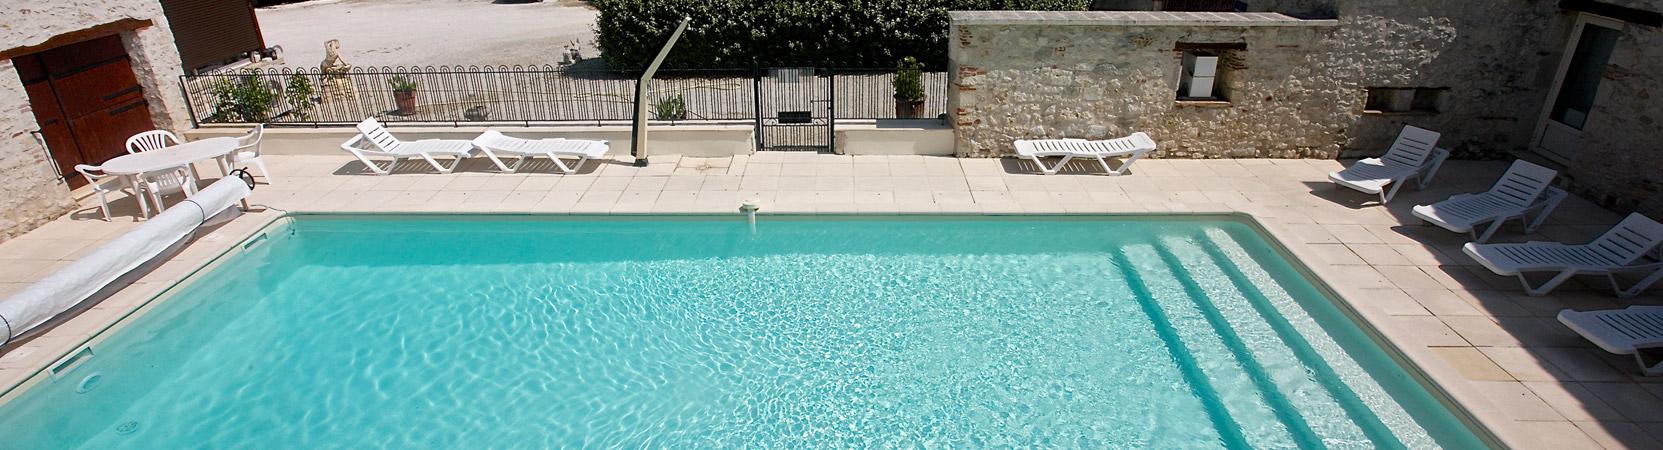 Gîte Norpech la piscine